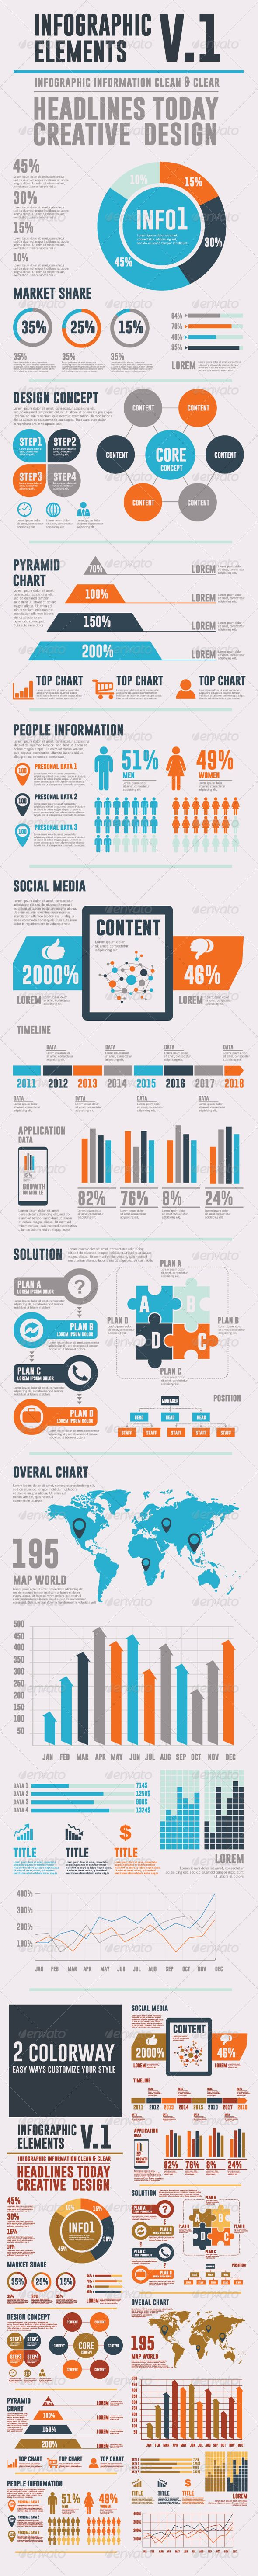 Infographic Elements V.1